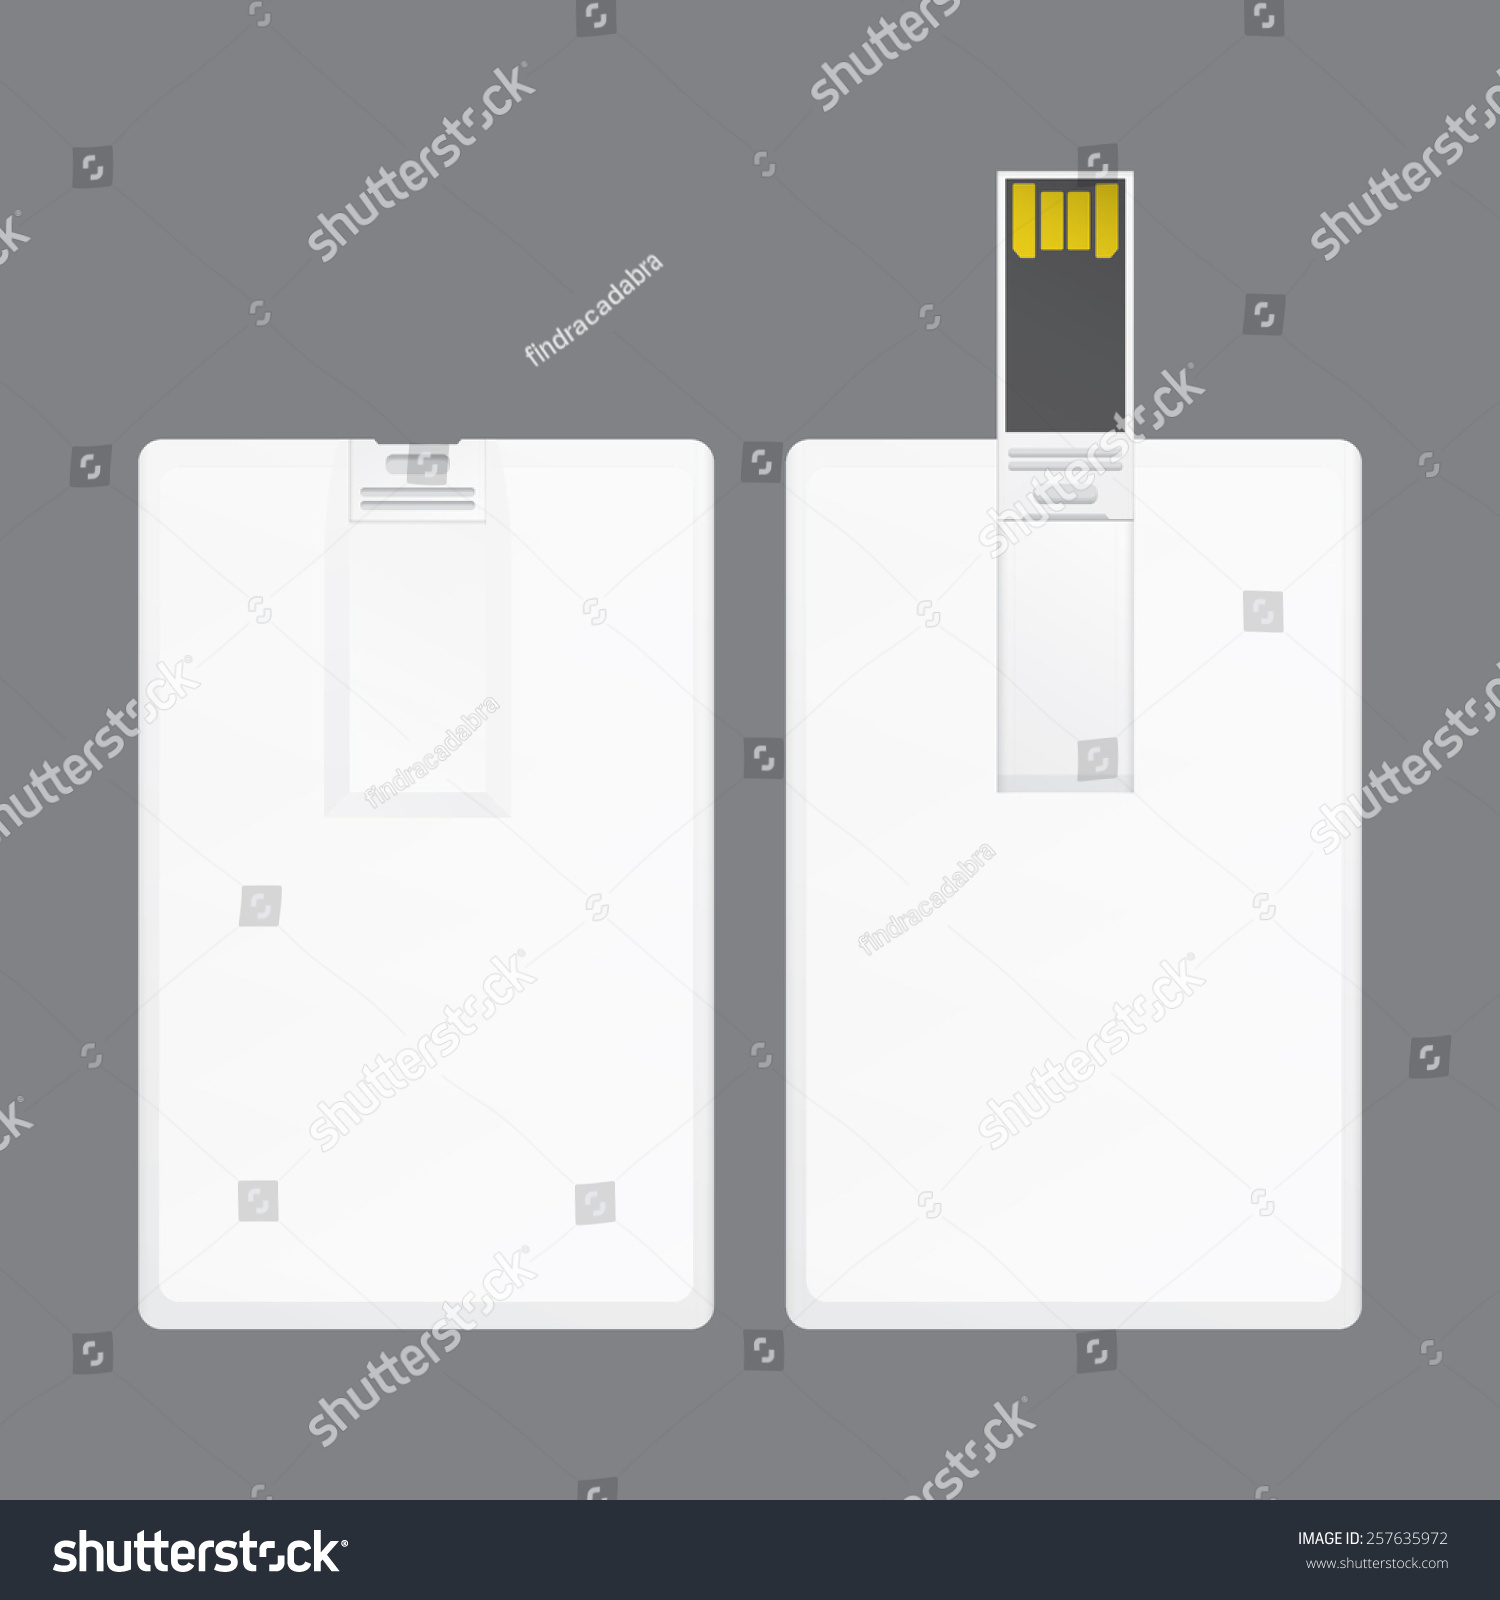 universal serial bus card template branding stock vector 257635972 shutterstock. Black Bedroom Furniture Sets. Home Design Ideas